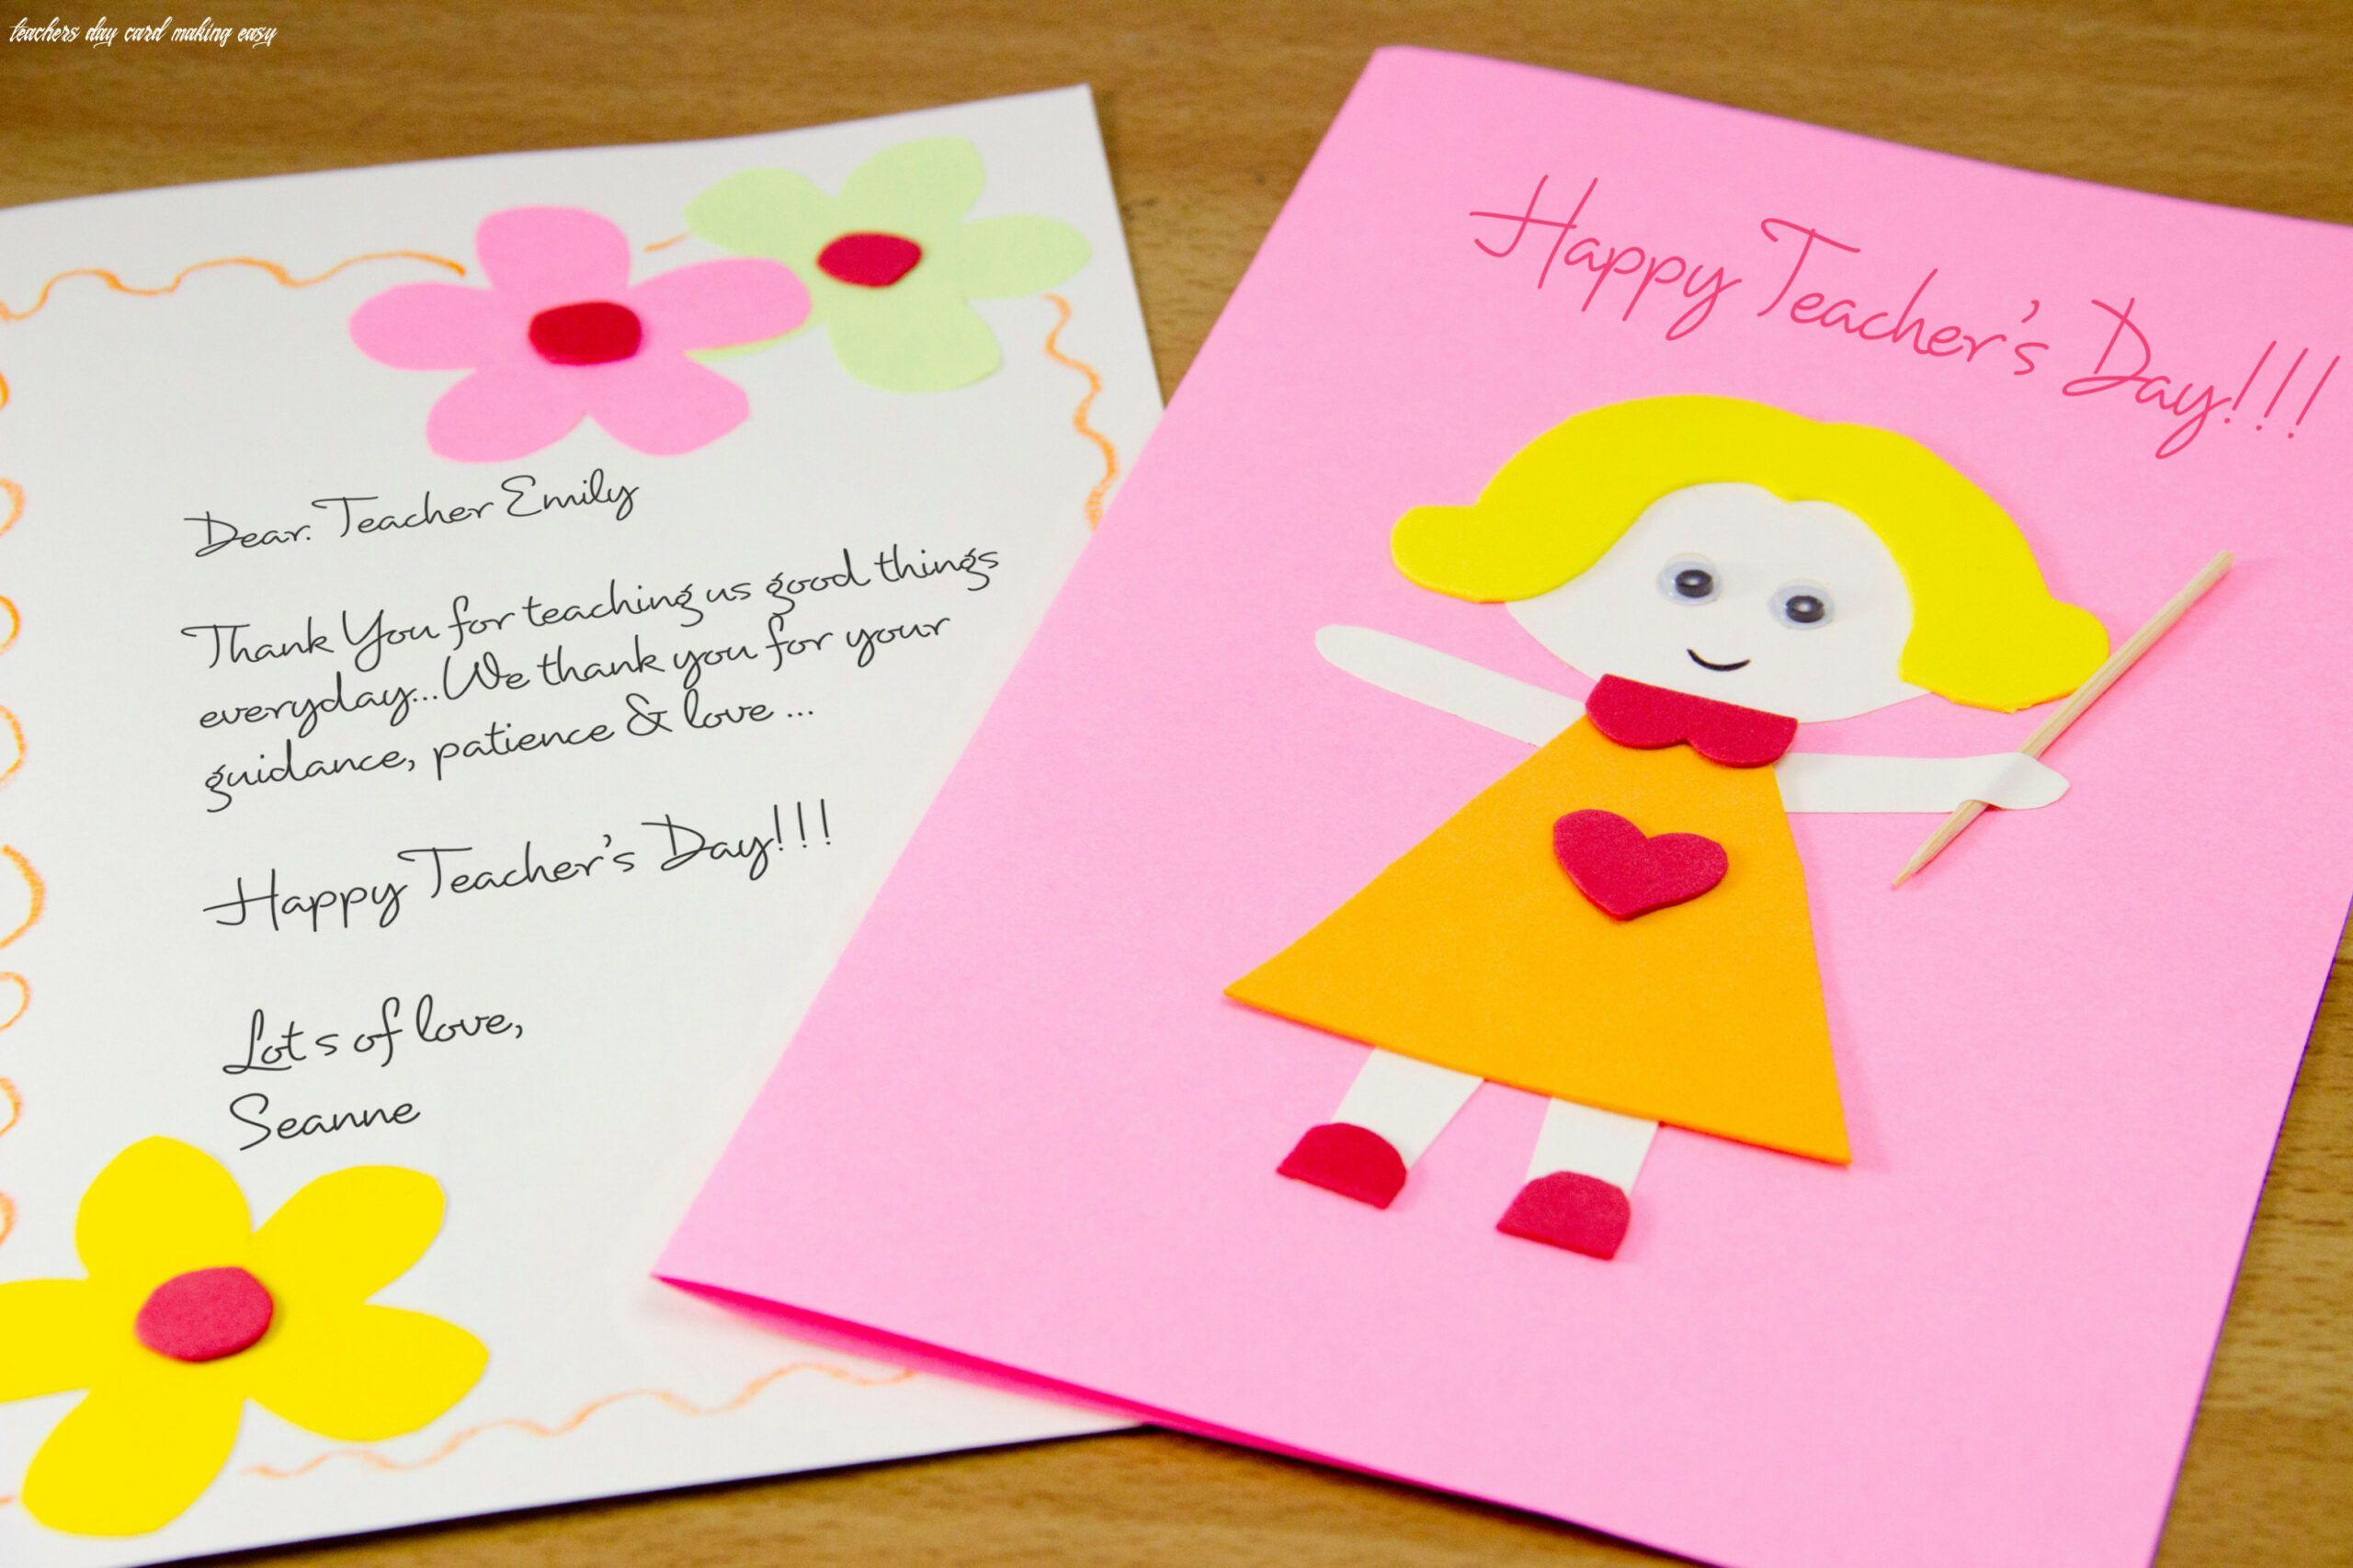 6 Teachers Day Card Making Easy In 2020 Teachers Day Card Teacher Birthday Card Simple Birthday Cards